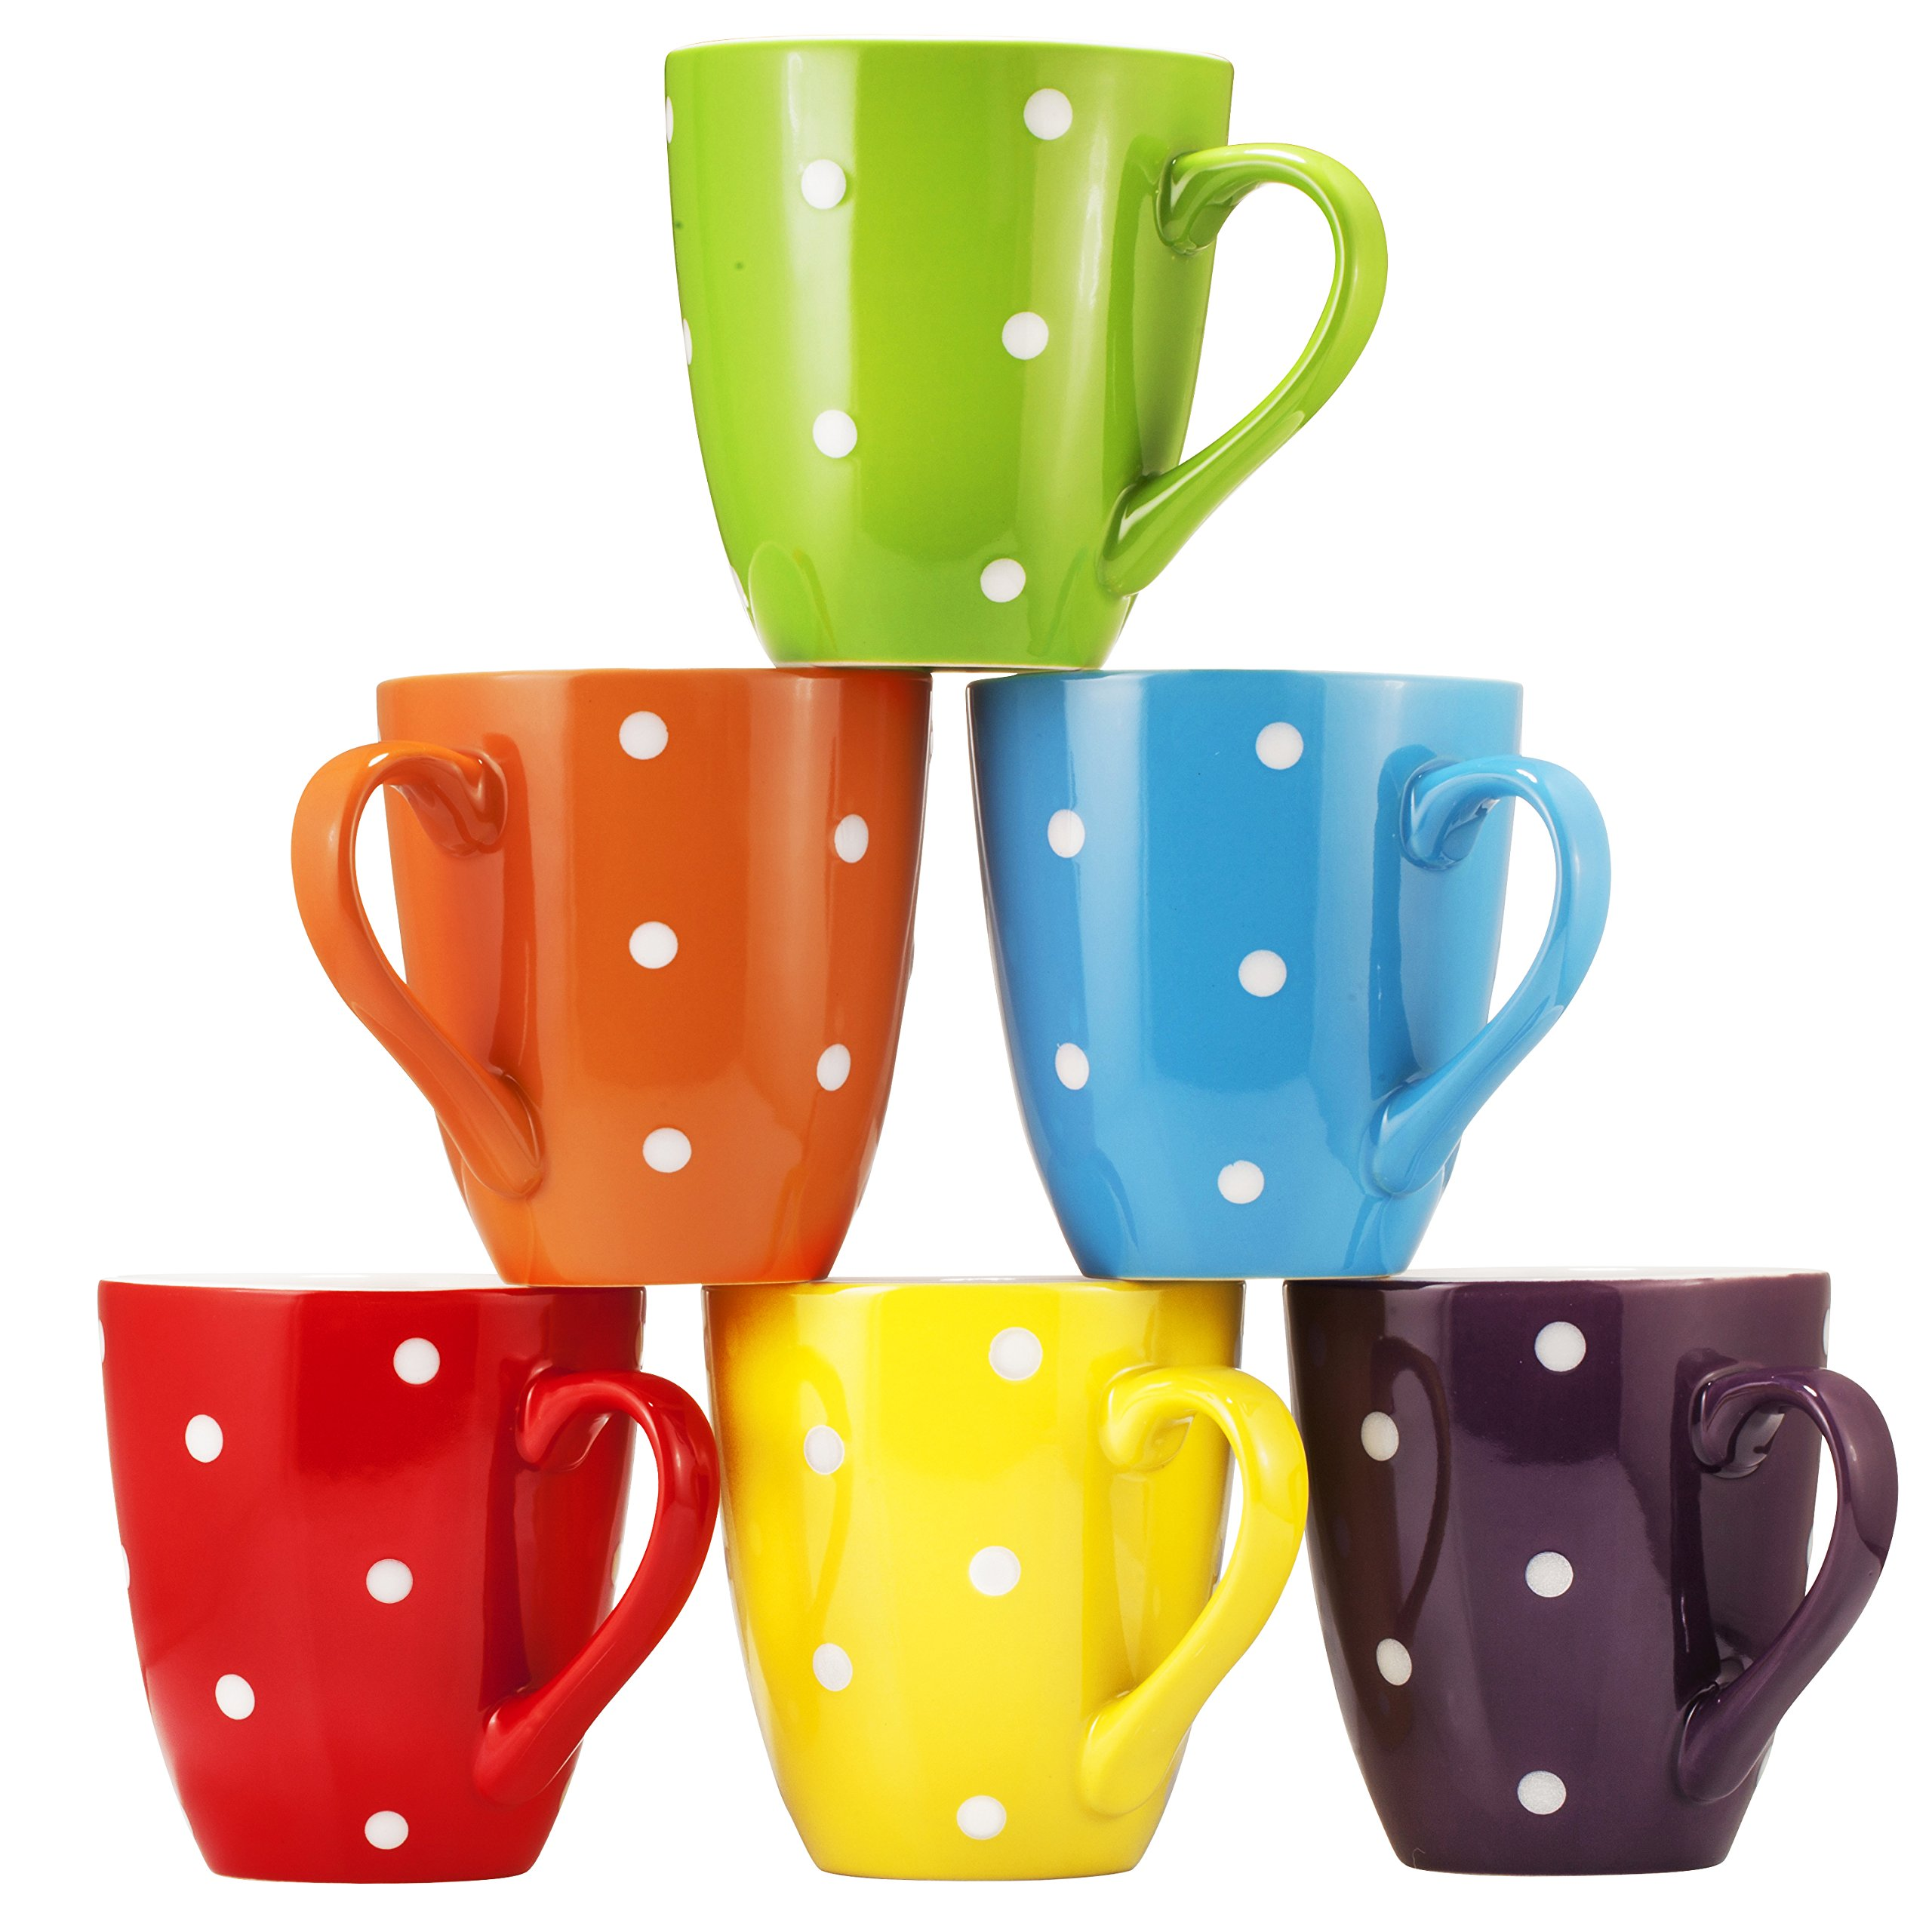 Coffee Mug Set Set of 6 Large-sized 16 Ounce Ceramic Coffee Mugs Restaurant Coffee Mugs By Bruntmor (Polka Dot) by Bruntmor (Image #4)